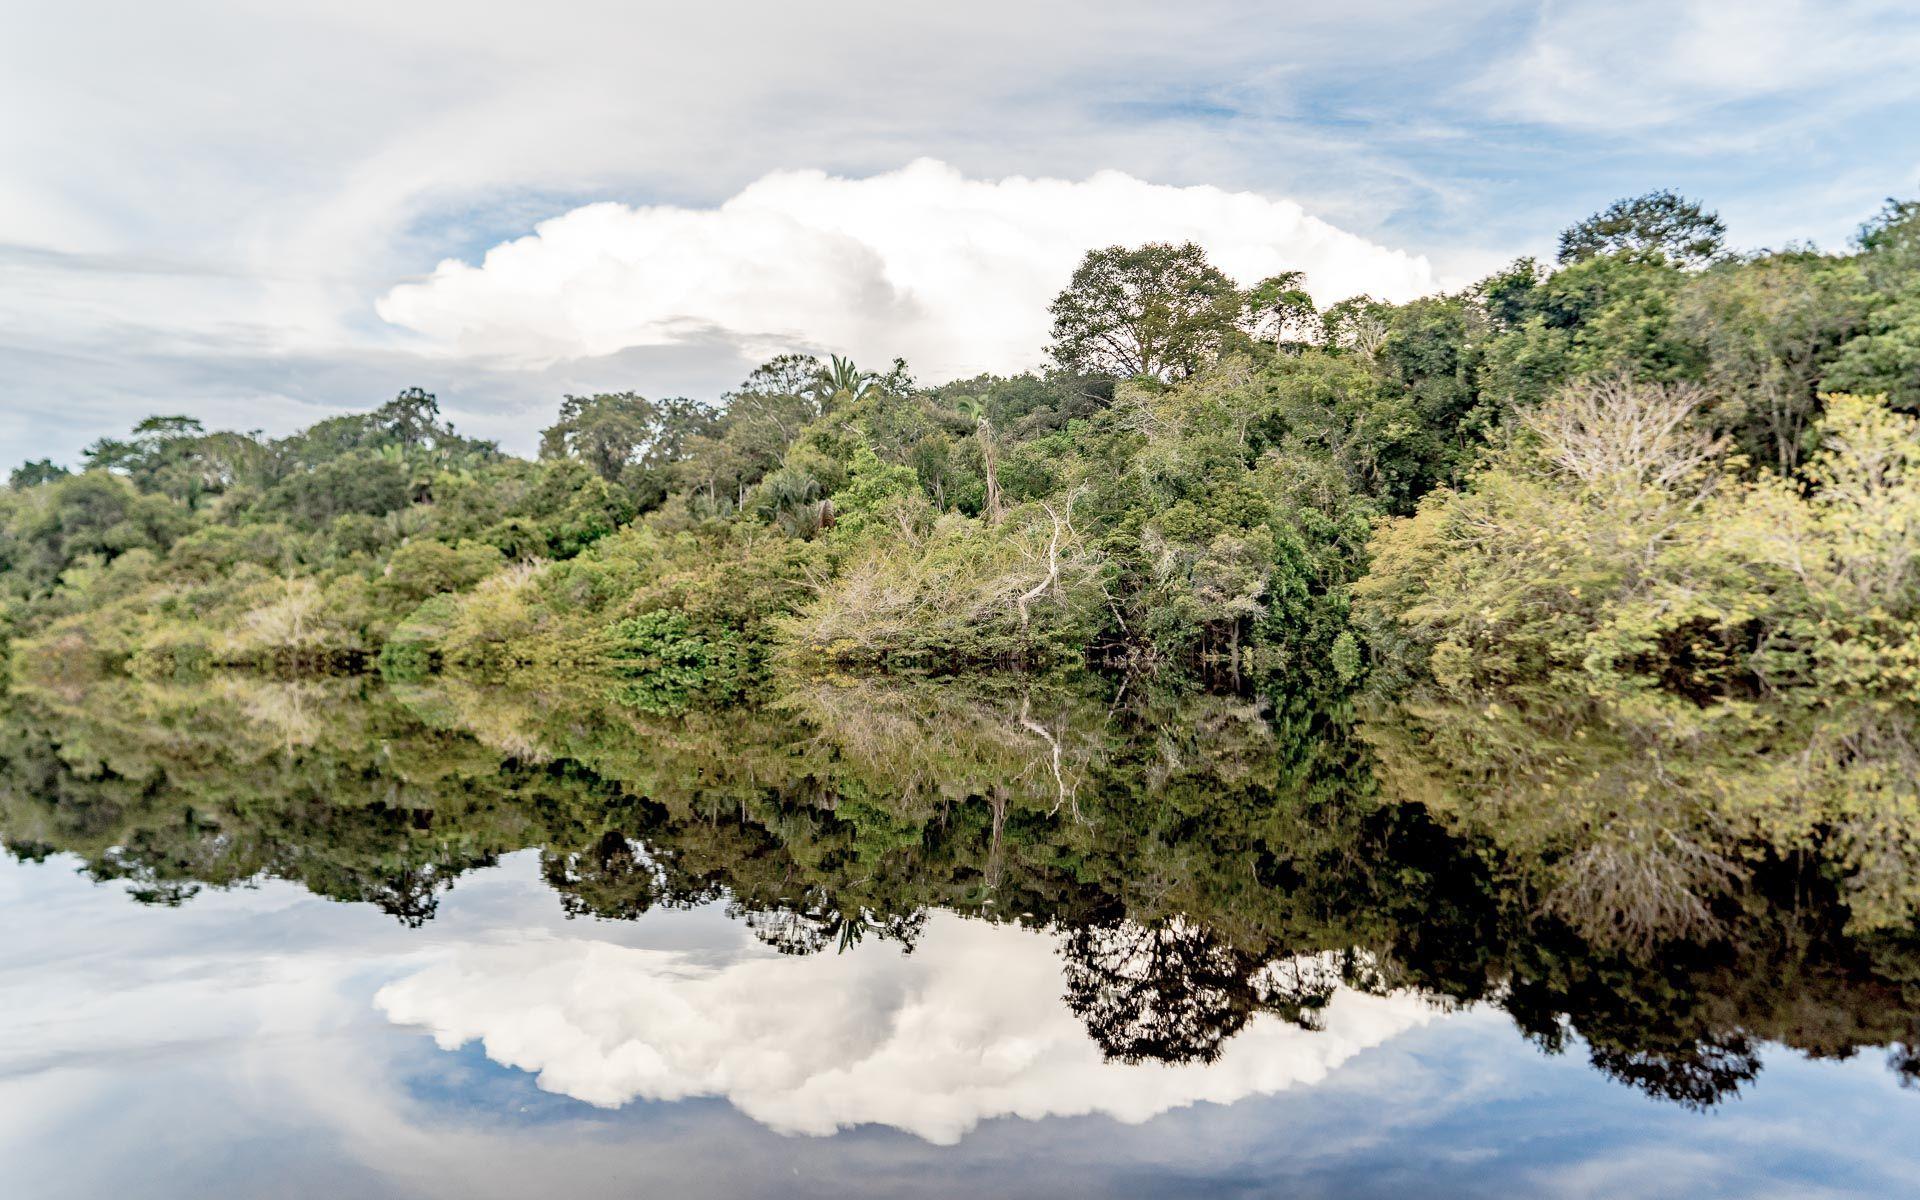 Lesvoyageuses-voyage-au-bresil-guide-conseils-amazonie-10